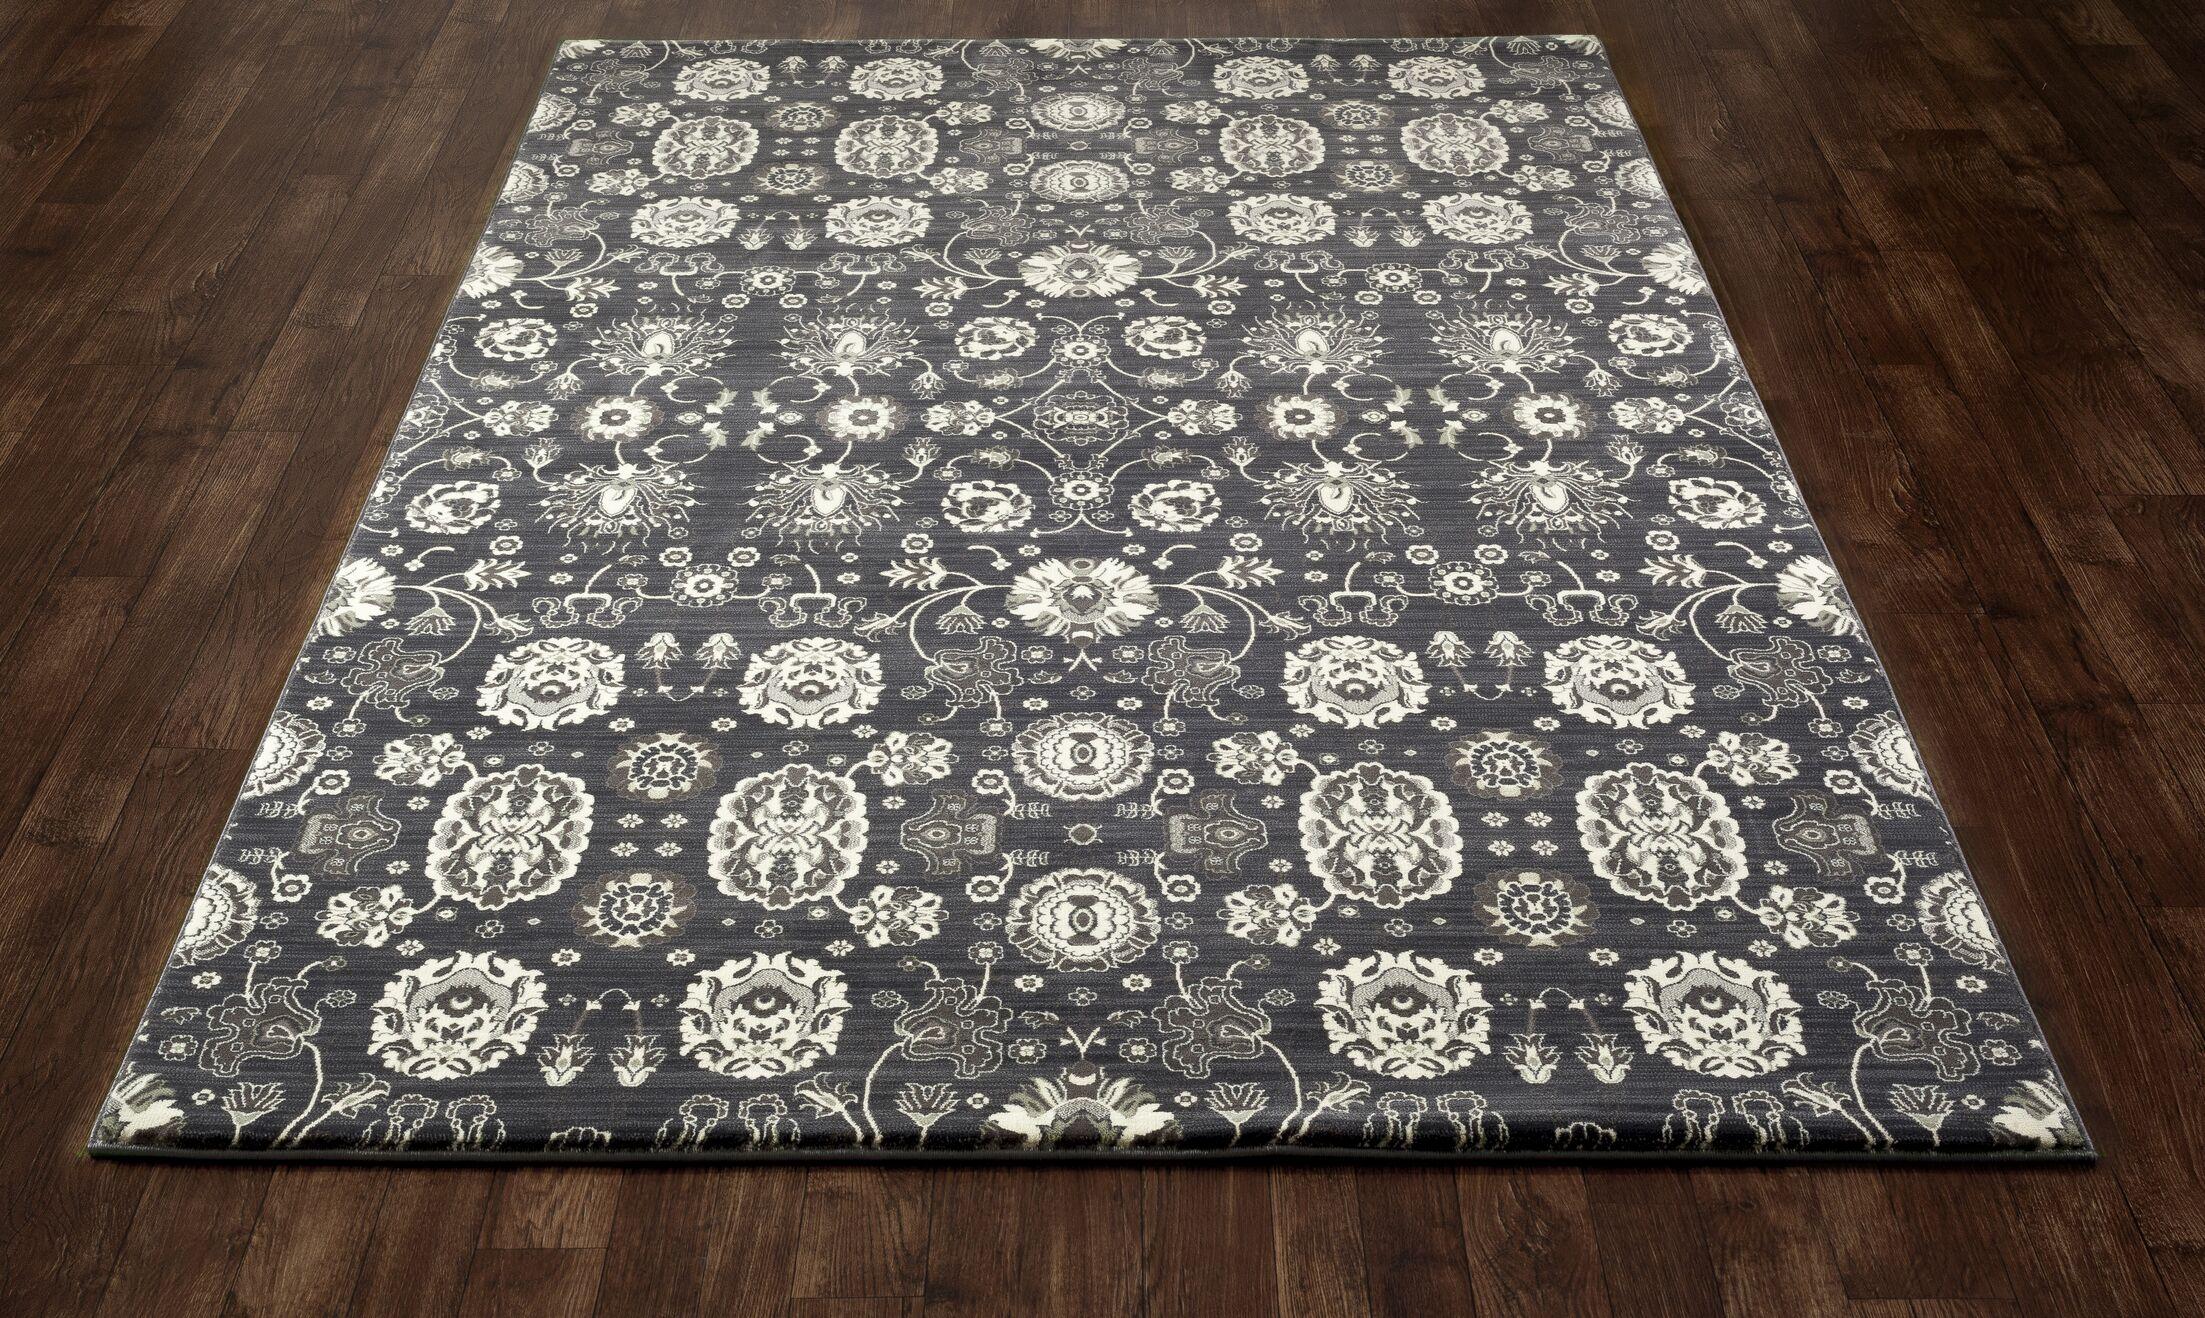 Castellano Dark Gray Area Rug Rug Size: 5'7 x 8'6